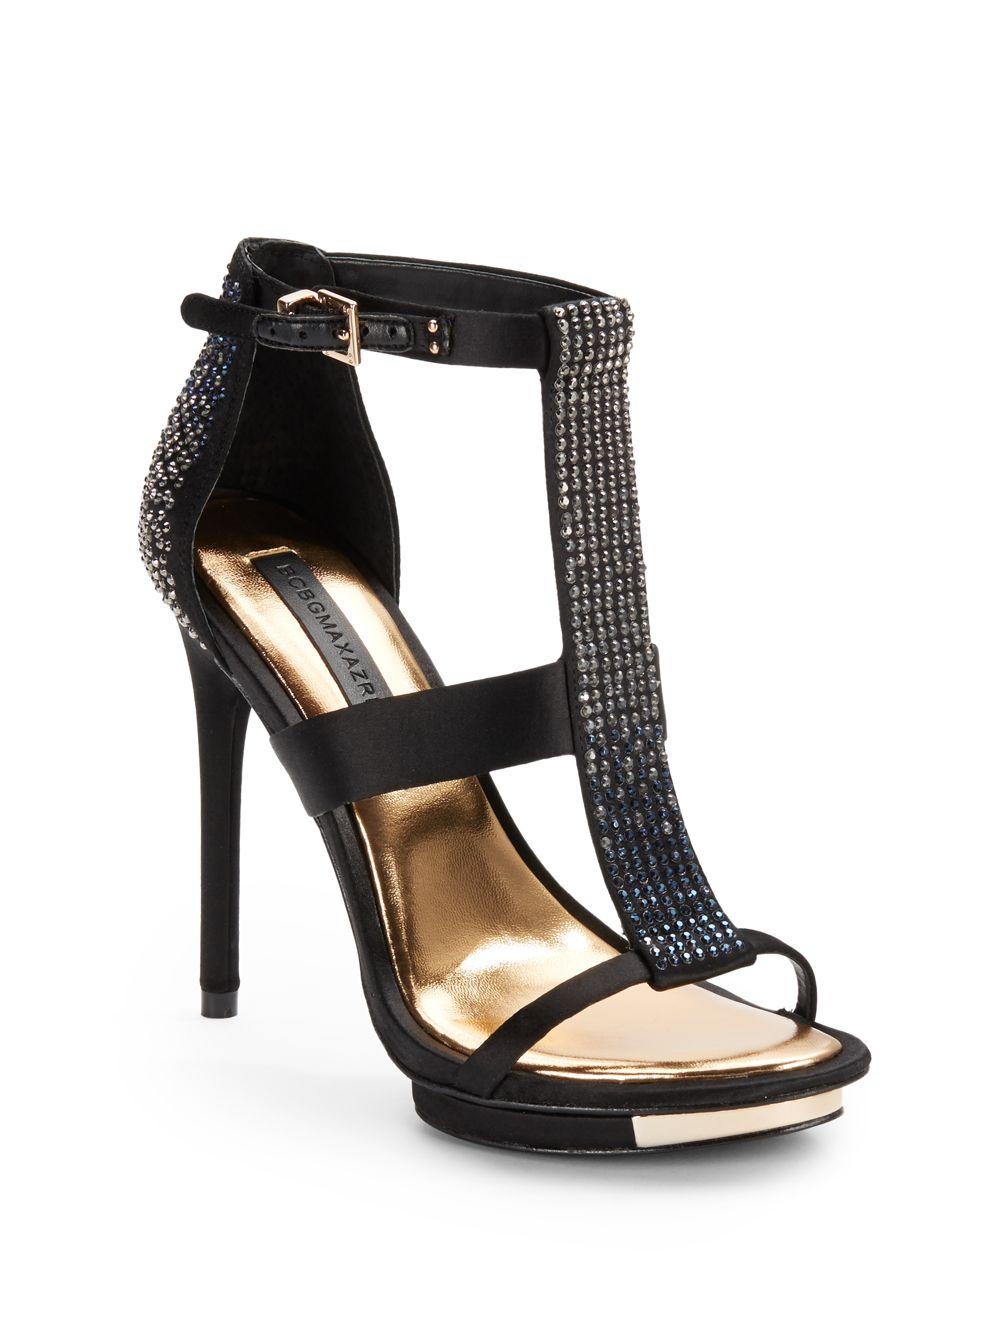 Bcbgmaxazria Lilie Jeweled High Heel Sandals In Black Lyst